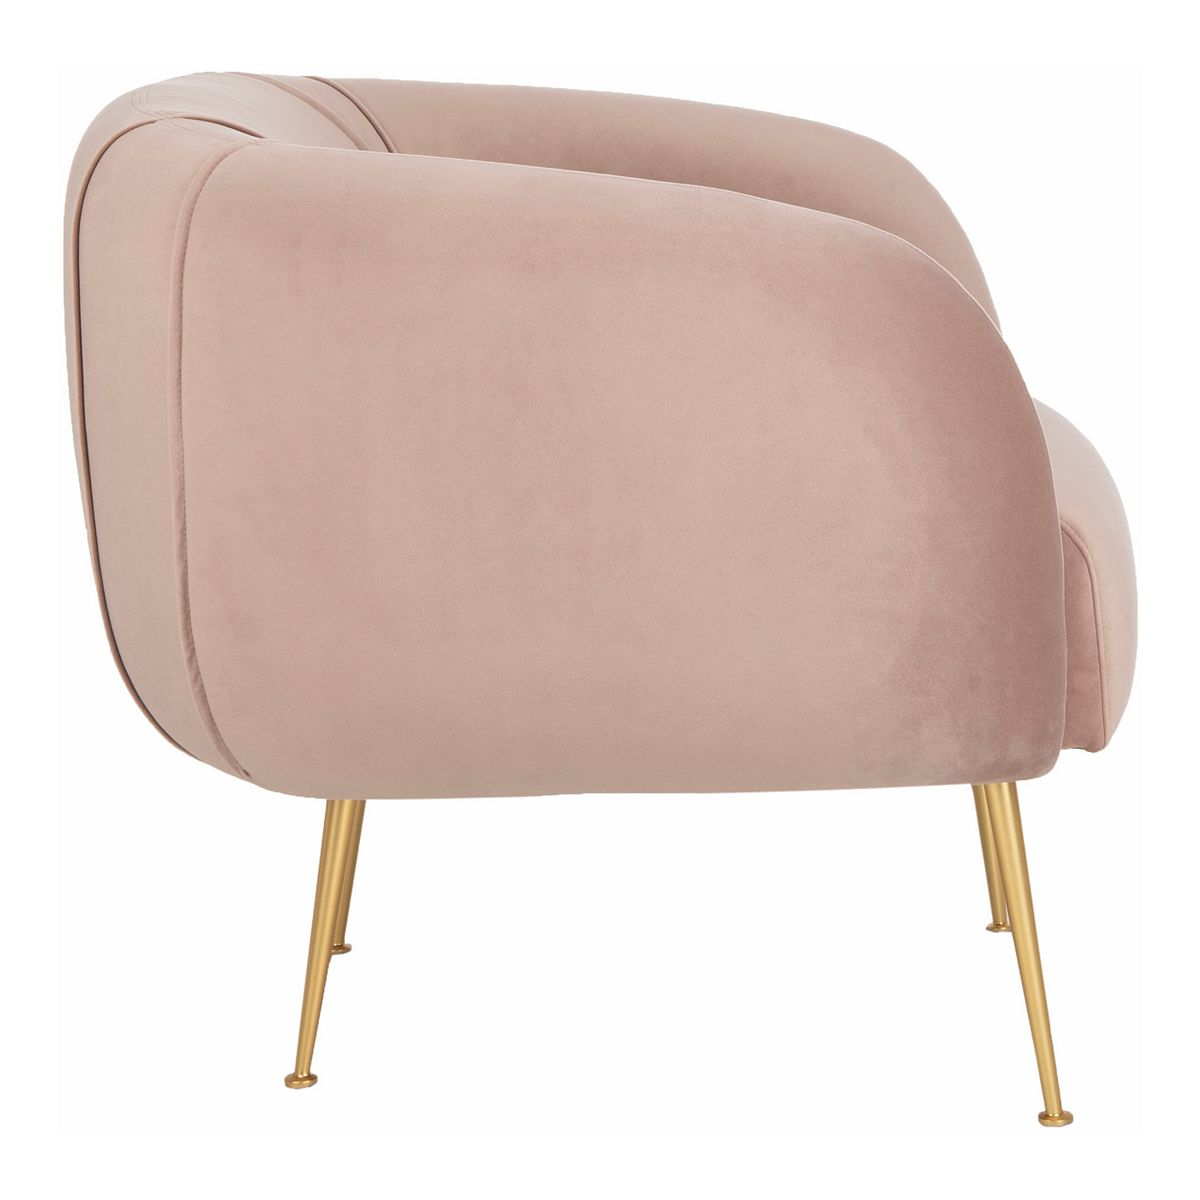 Safavieh Alena Poly Blend Accent Chair 6NMOH